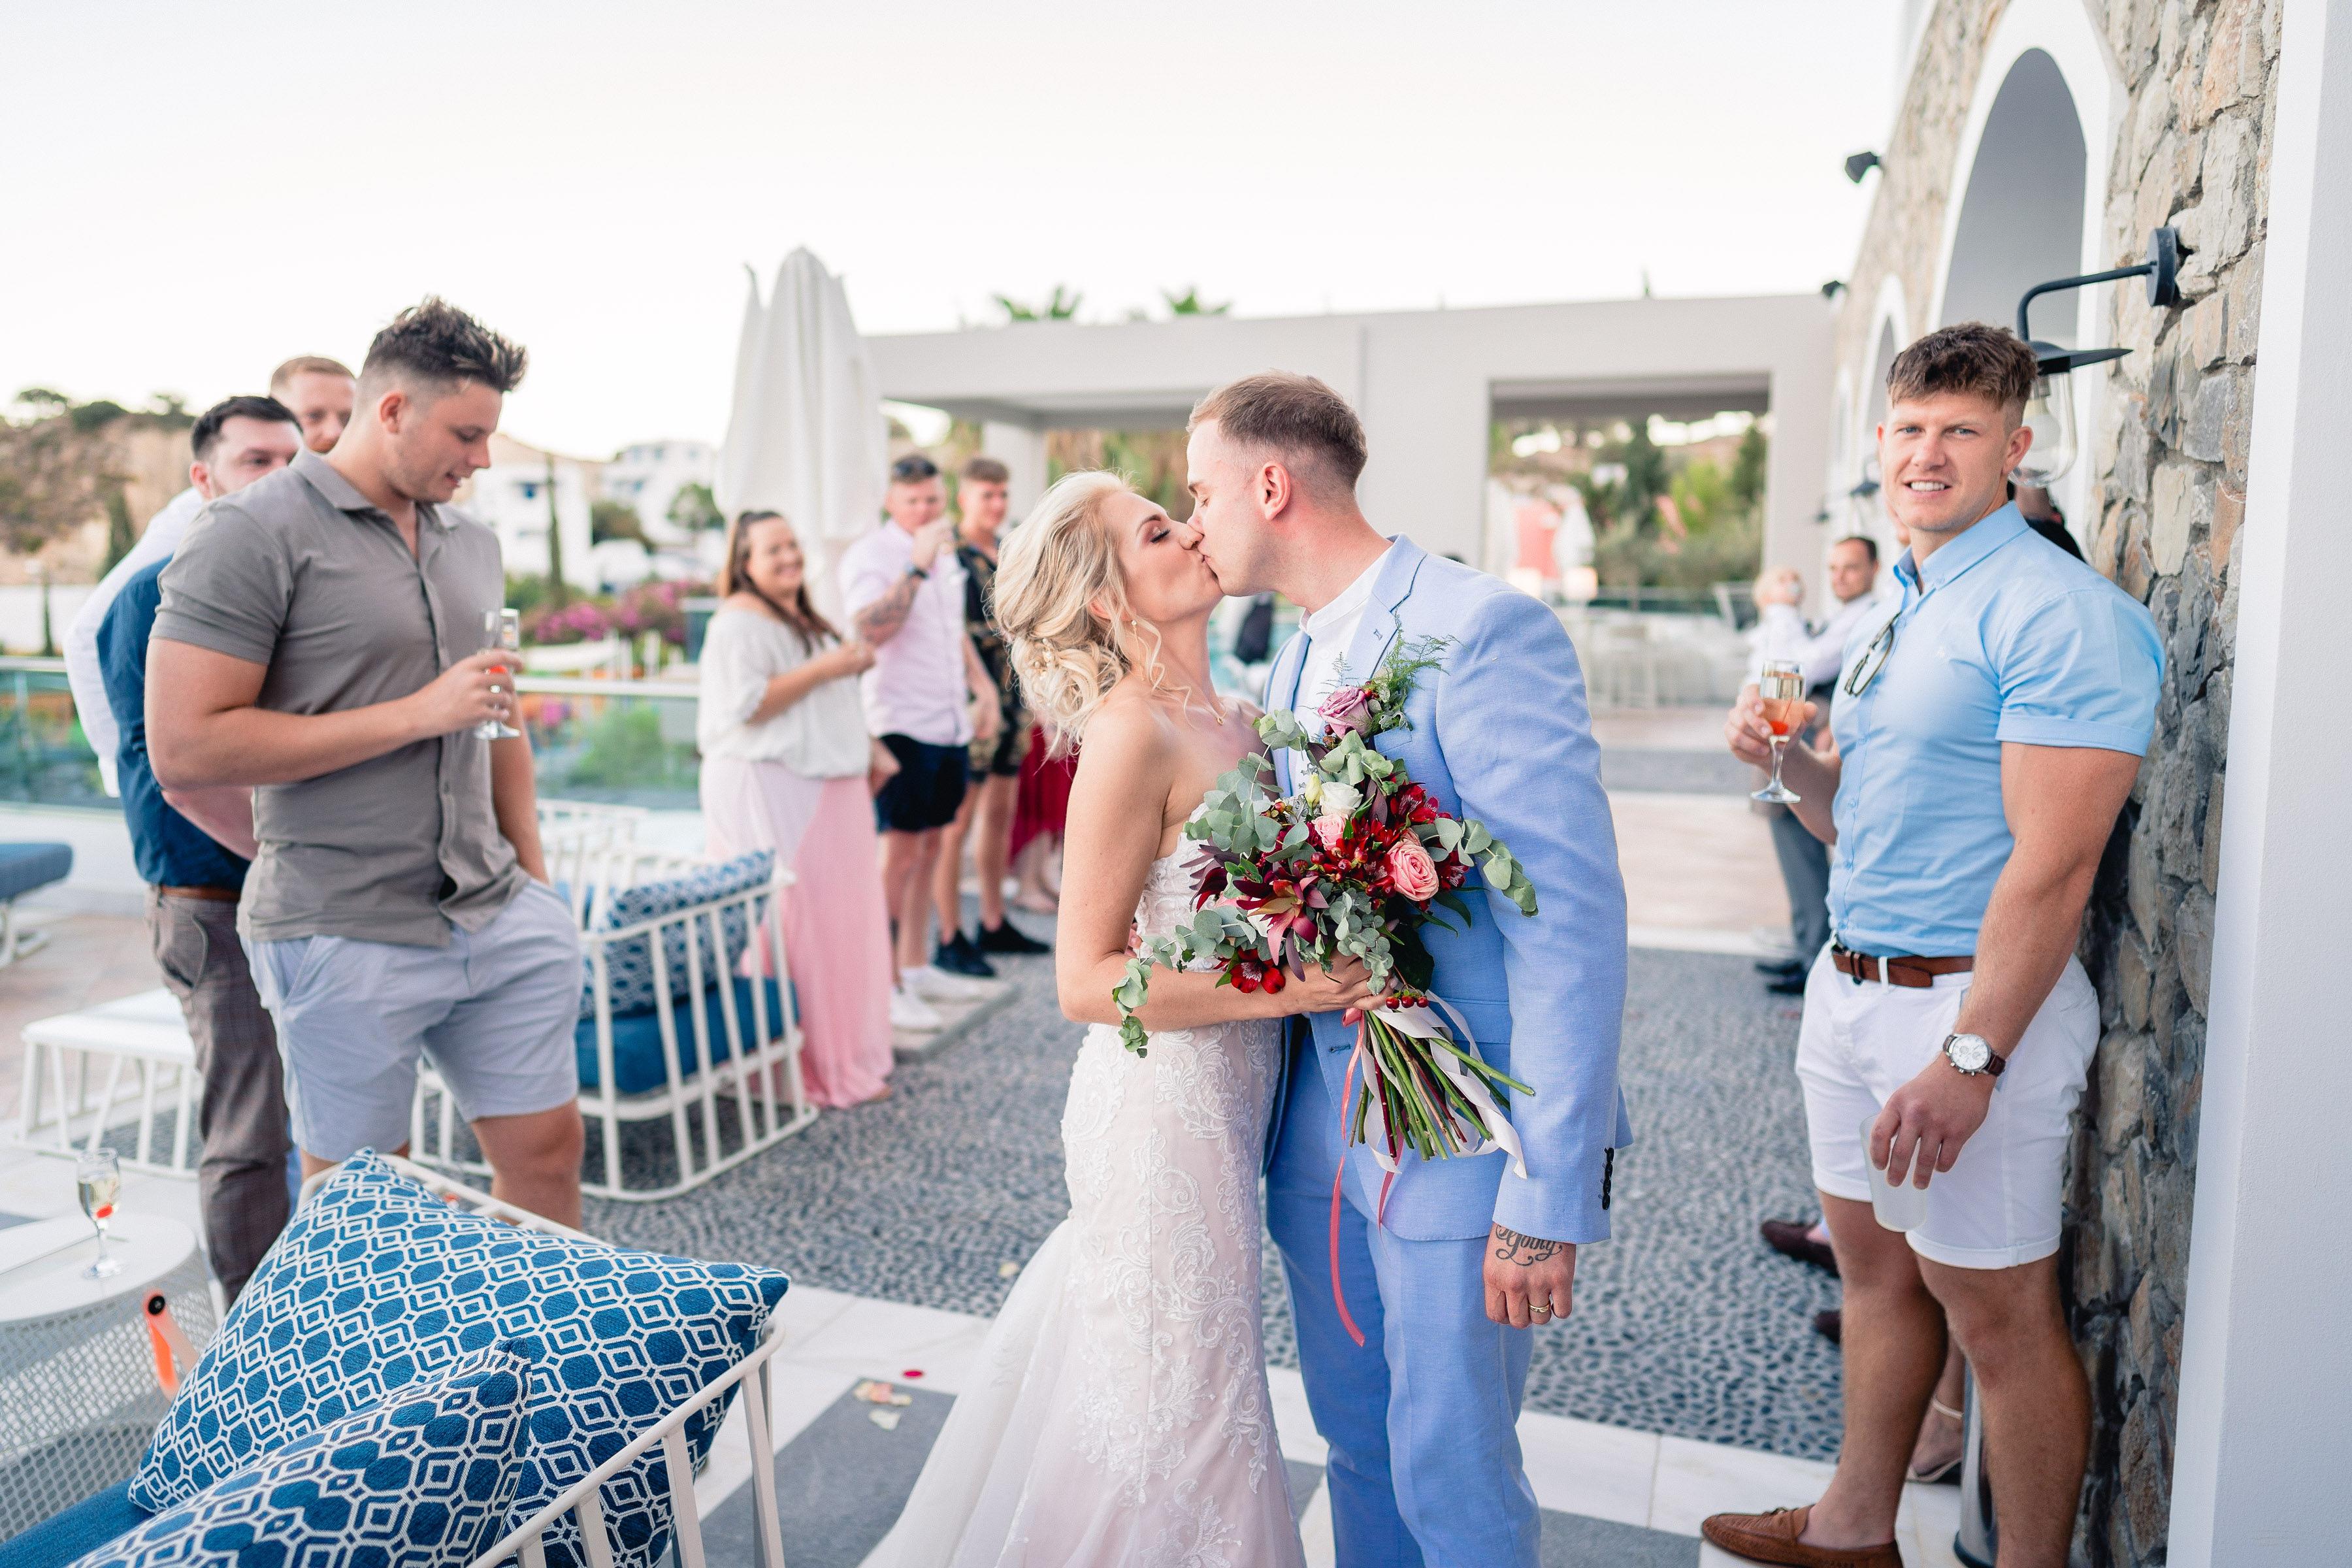 Jara&Alistair-Porto-Angeli-Wedding-320